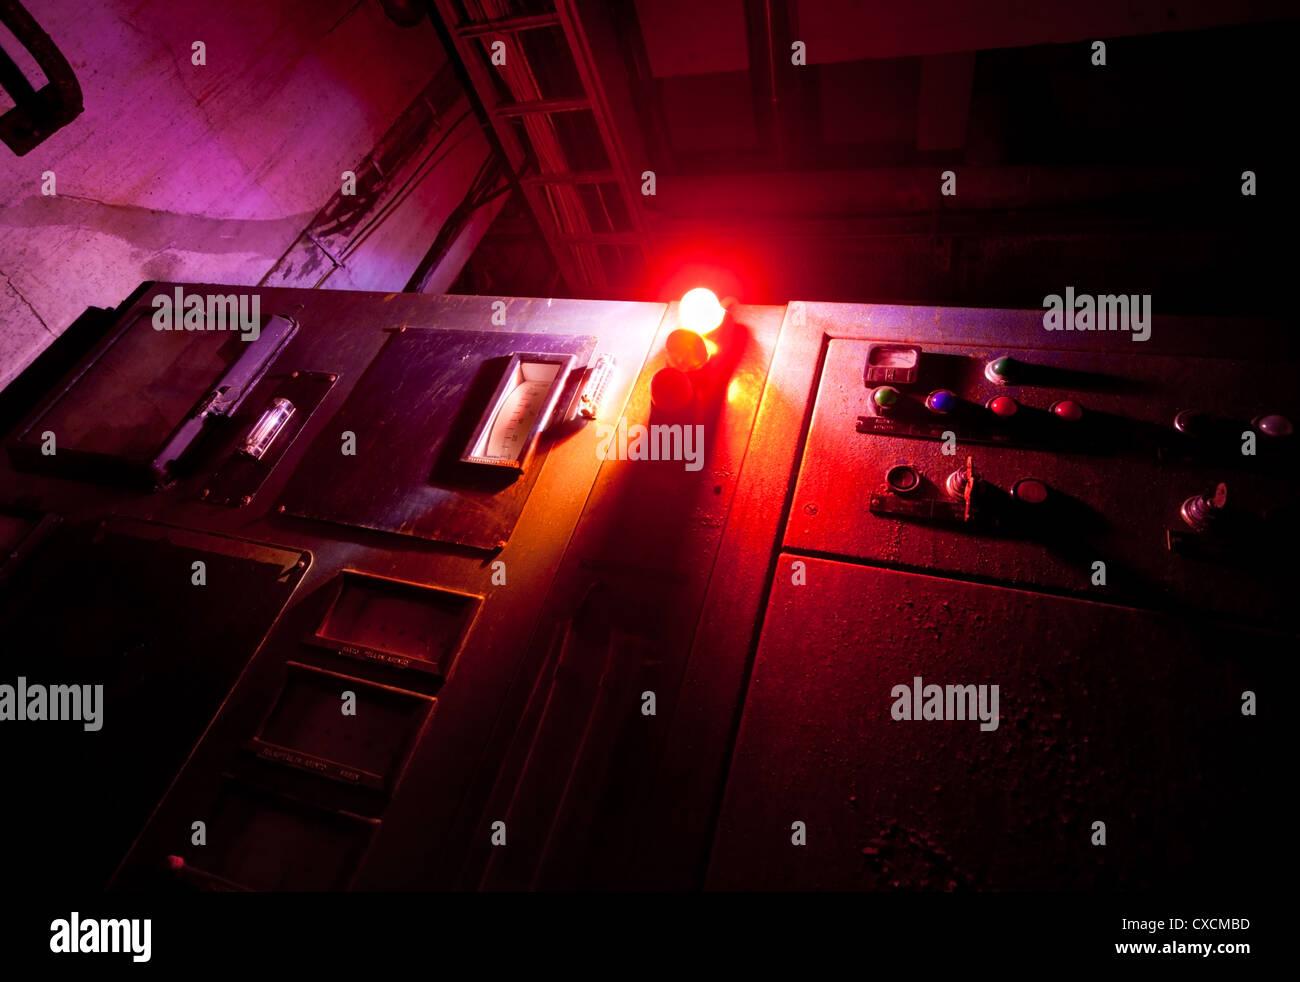 Red alert - Stock Image